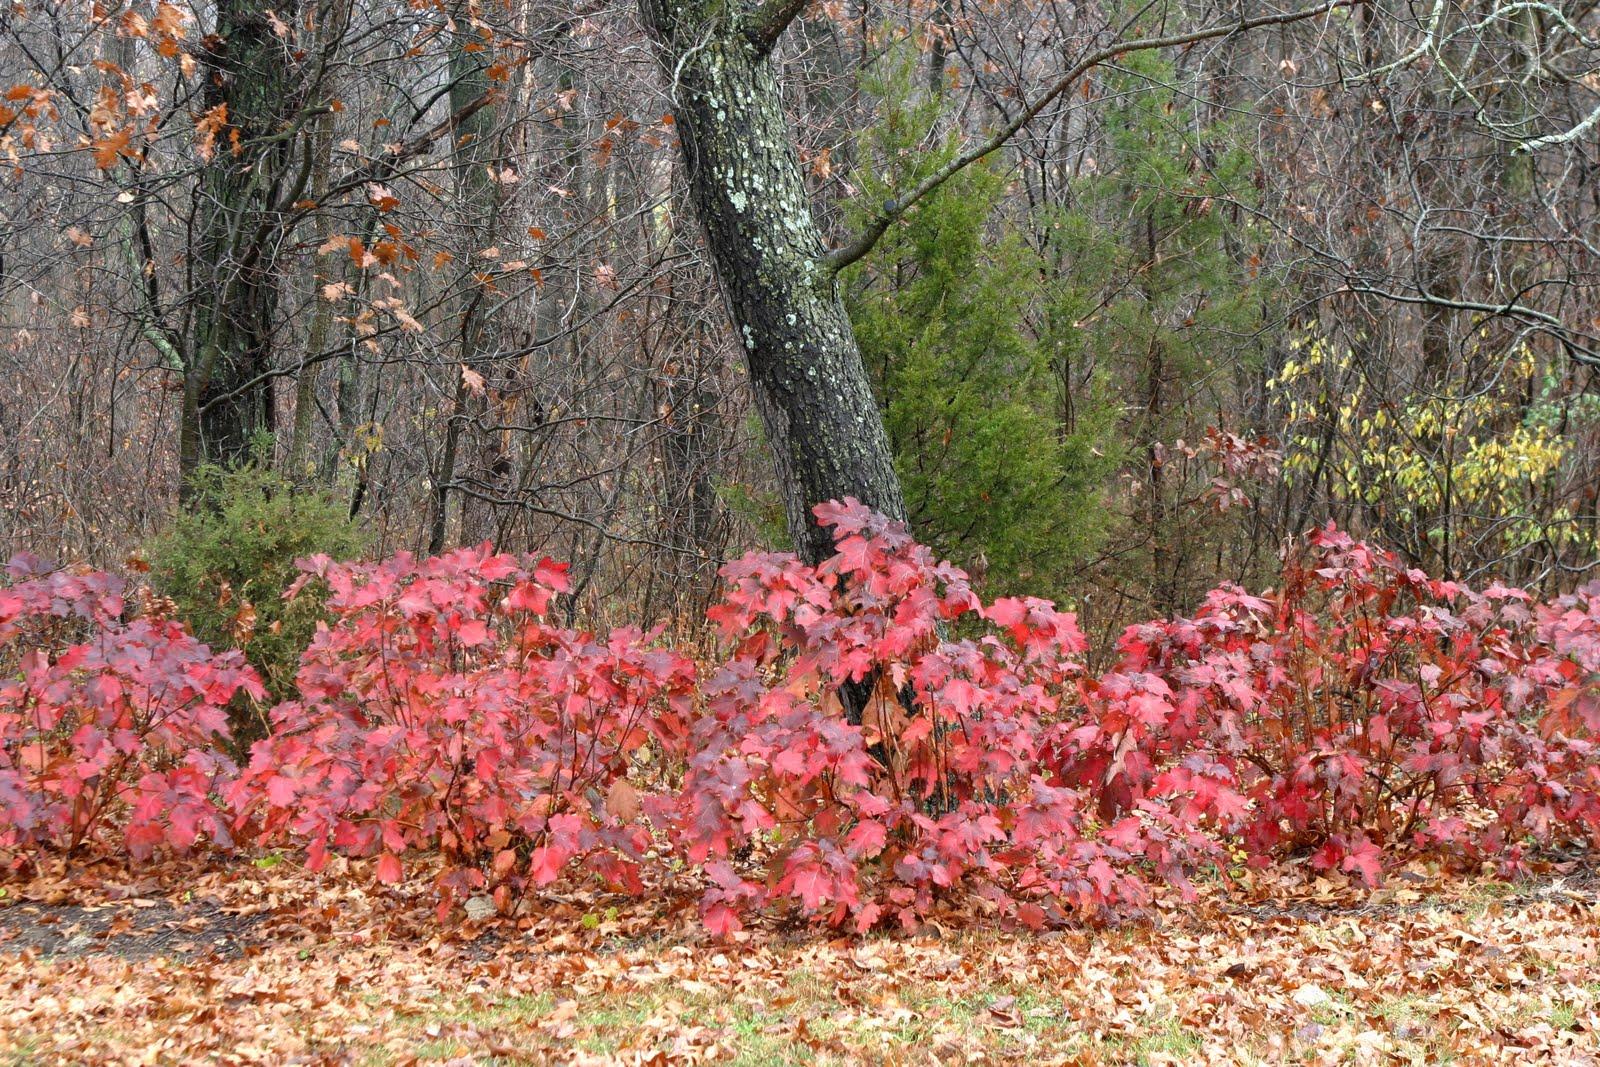 The masses of Oakleaf Hydrangeas   Hydrangea quercifolia   along the    Oakleaf Hydrangea Fall Color